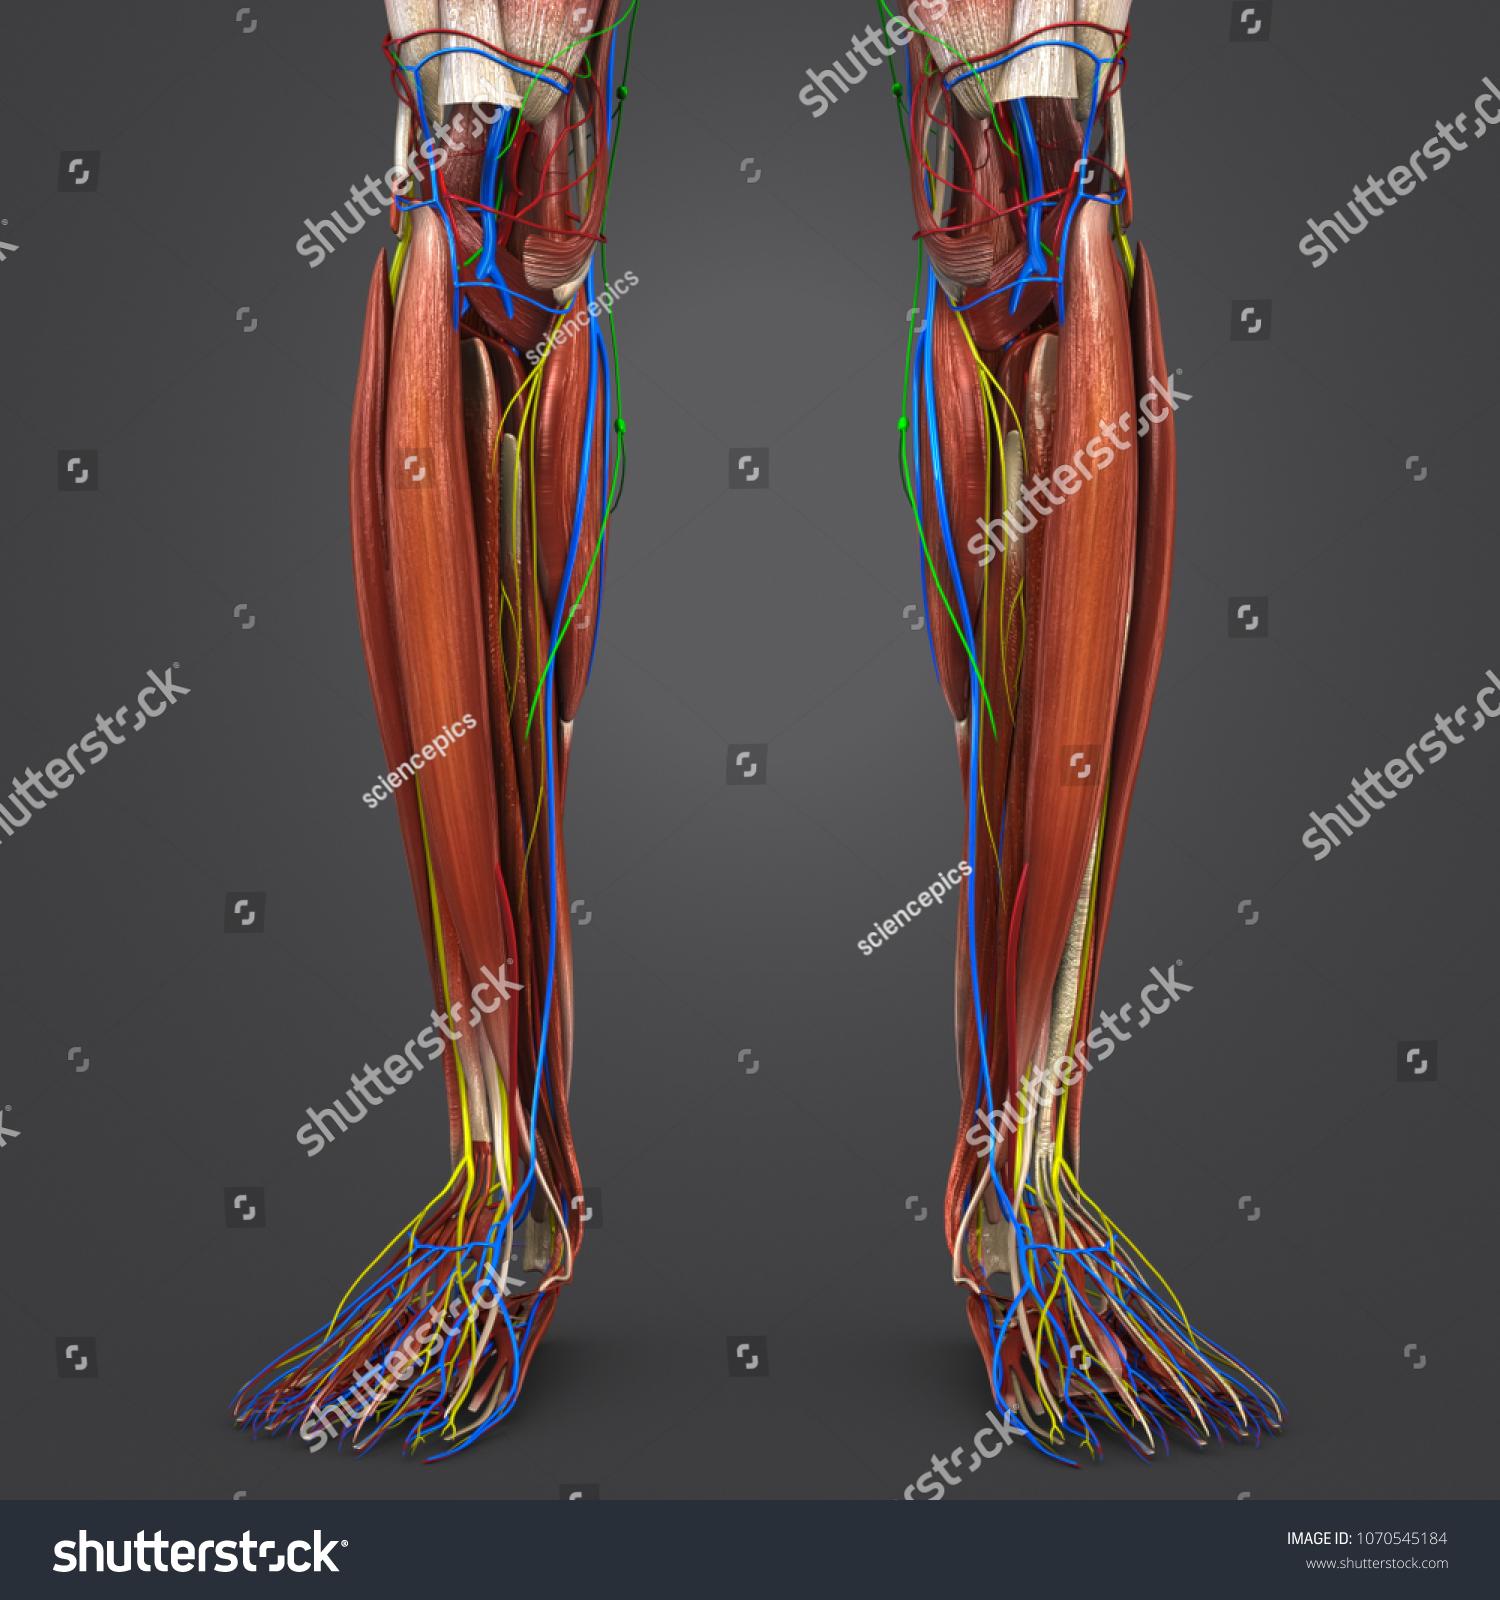 Legs Muscle Anatomy Arteries Veins Nerves Stock Illustration